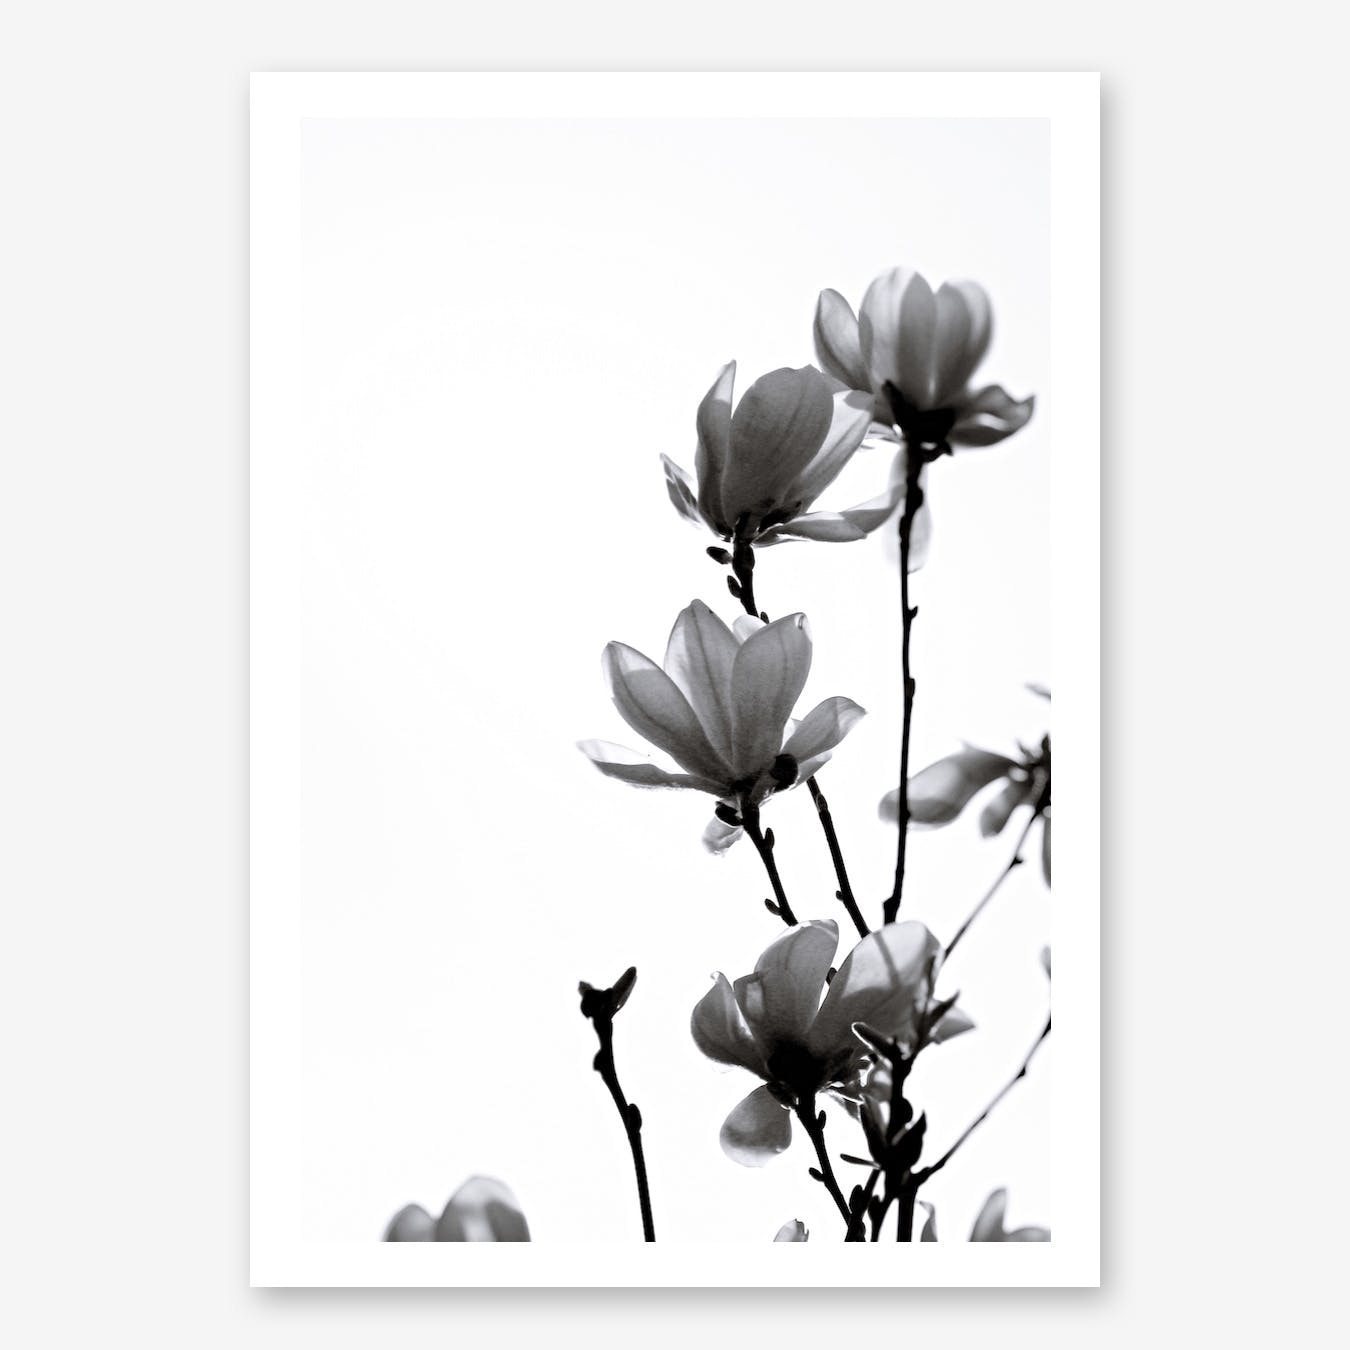 Black Magnolia in Print